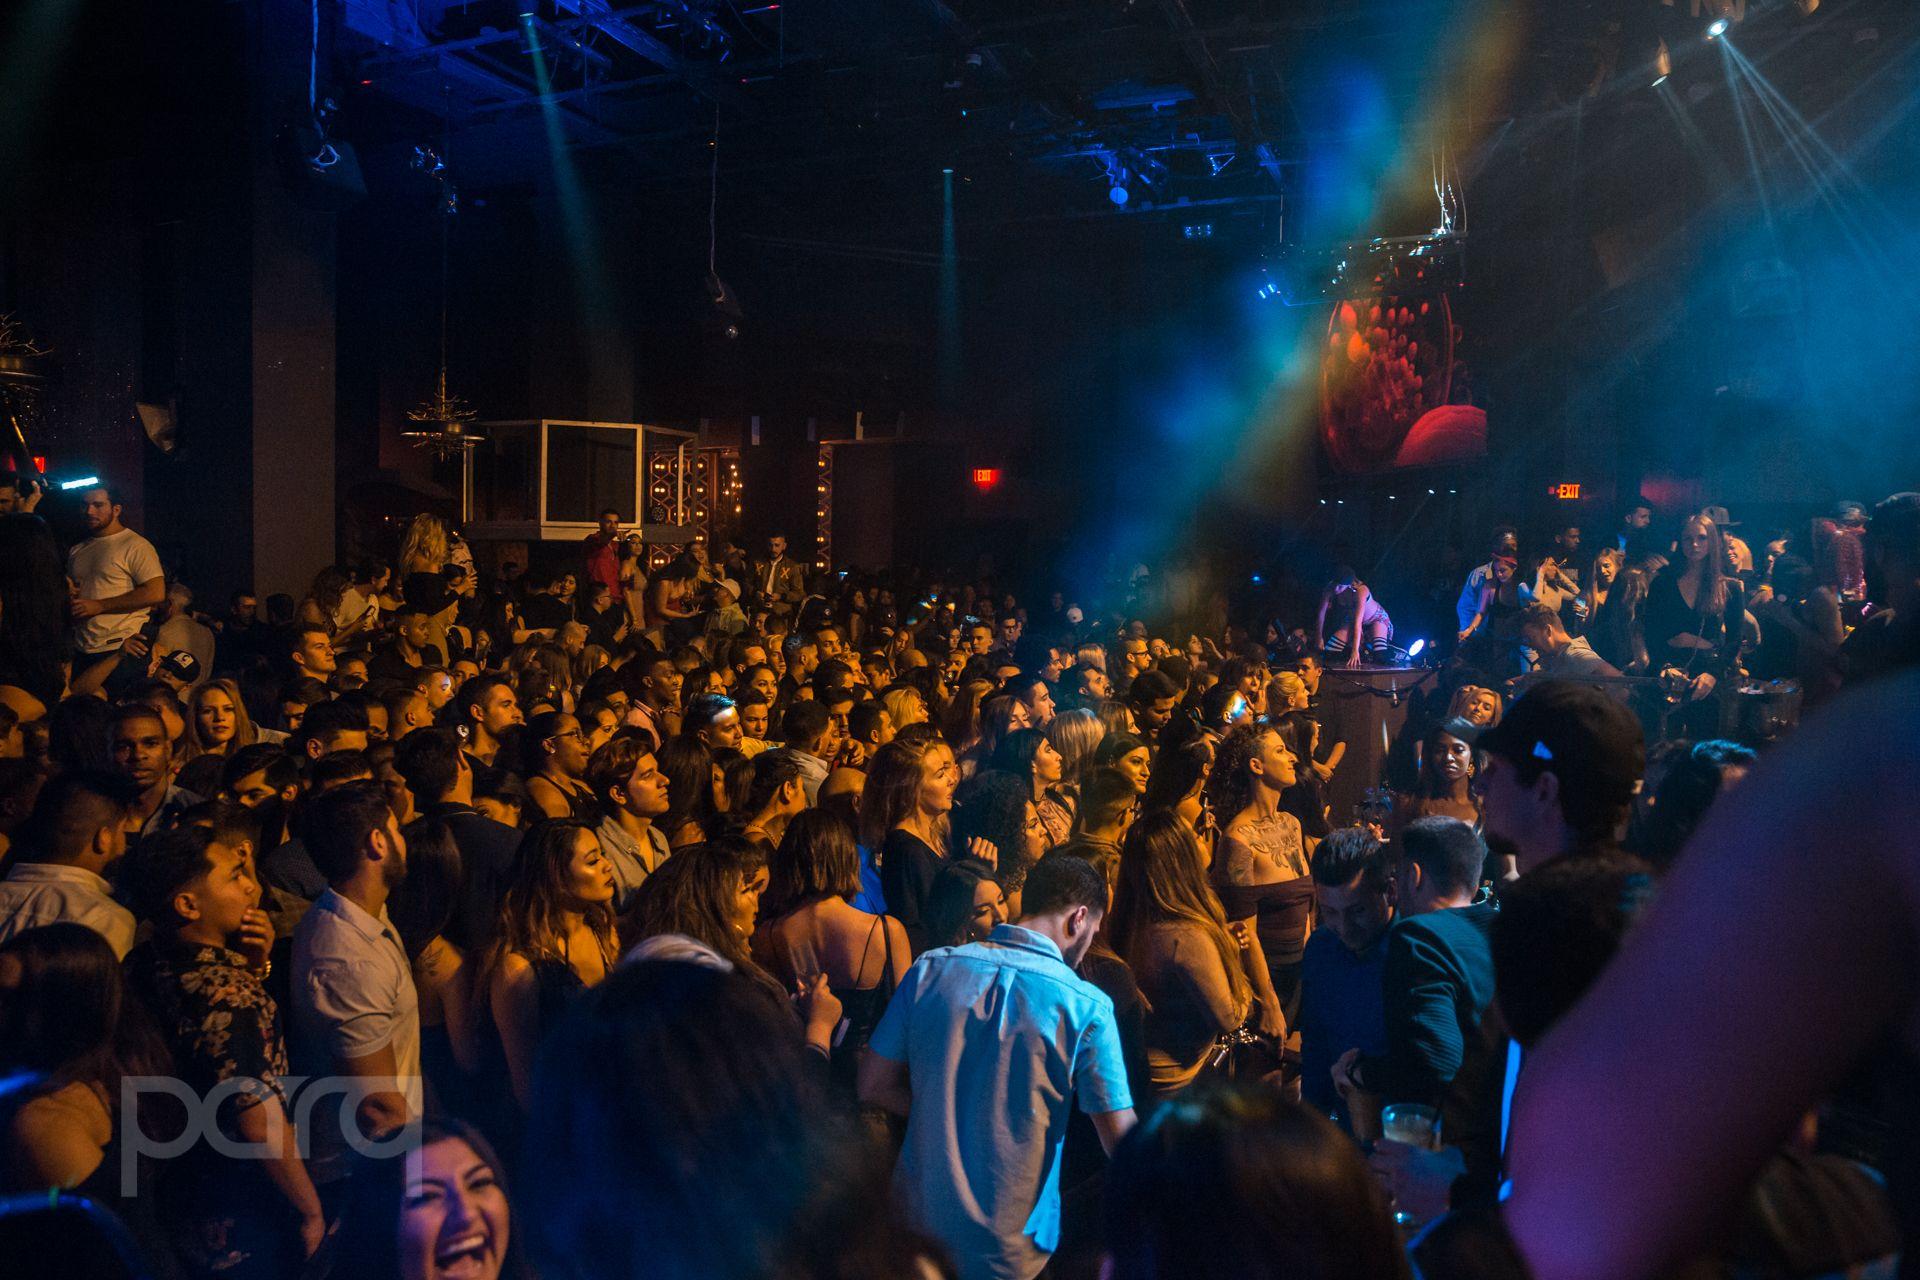 Fetty Wap - 02 03 18 - PARQ SD - Nightclub